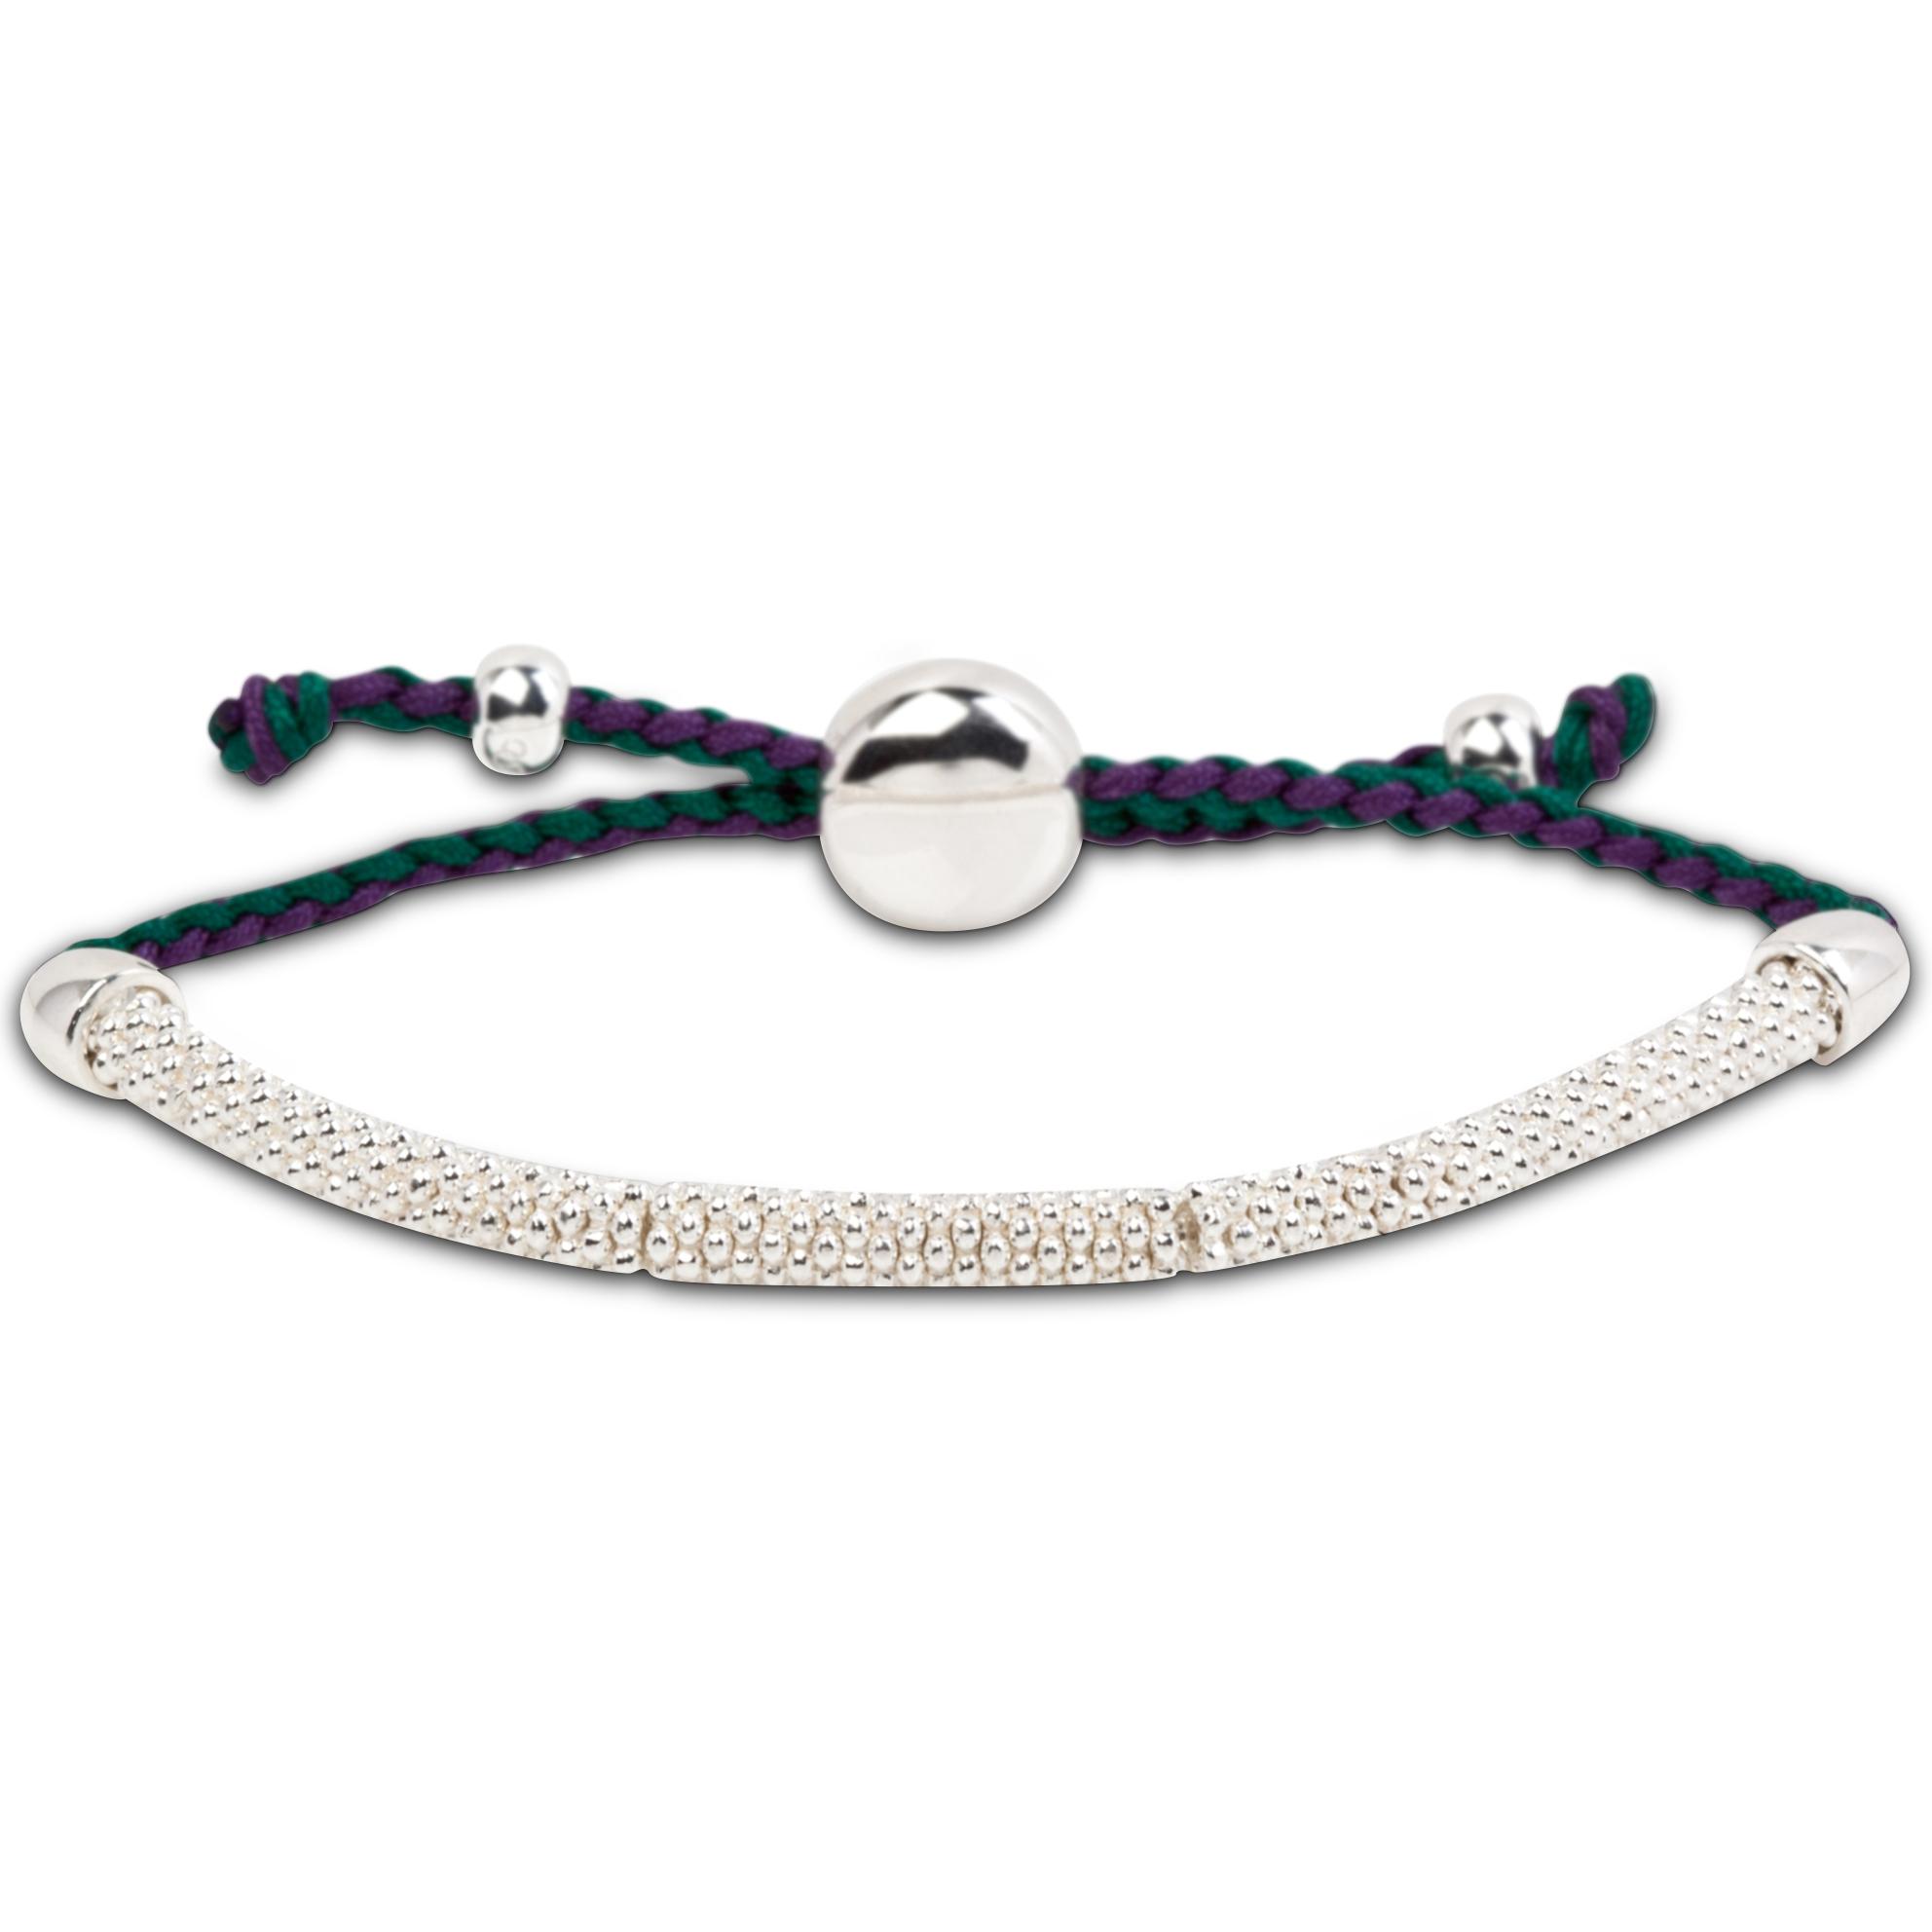 Wimbledon Effervescence XS Cord Bracelet